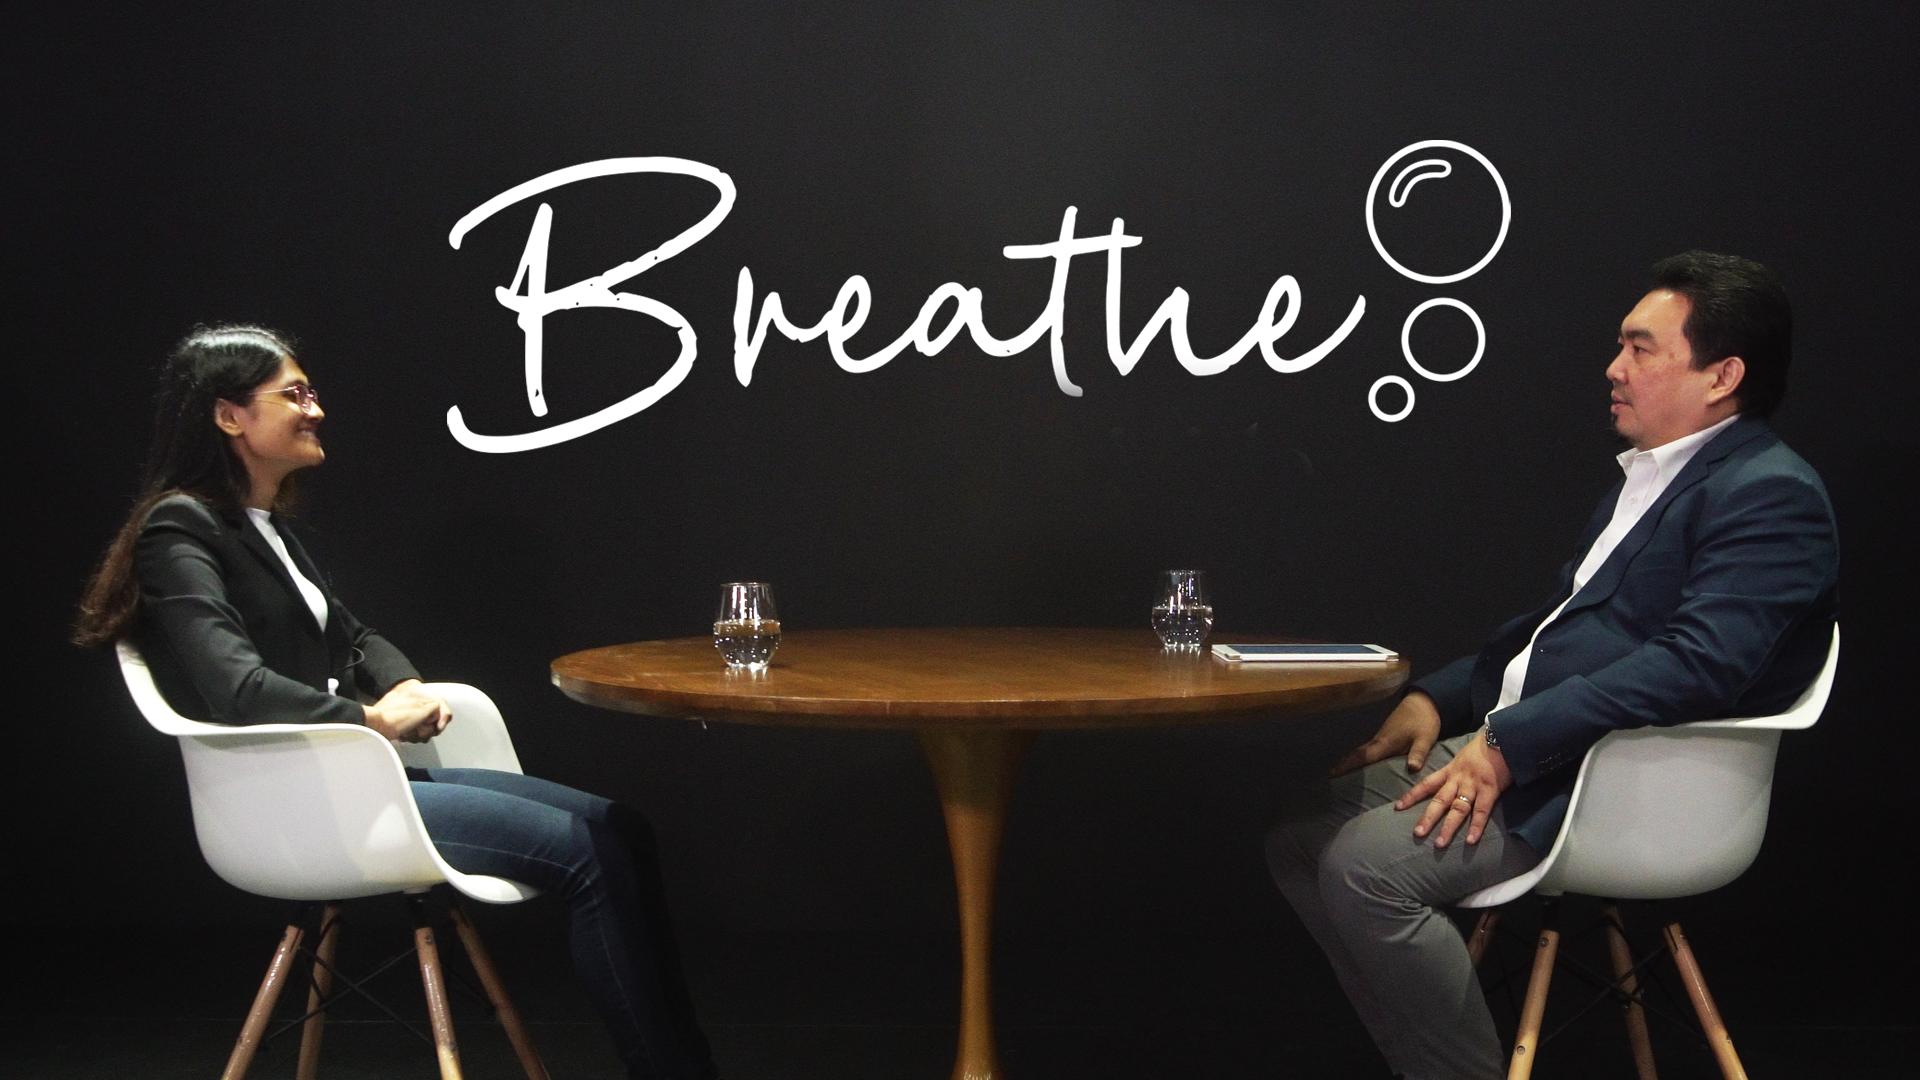 Breathe: Self-harm